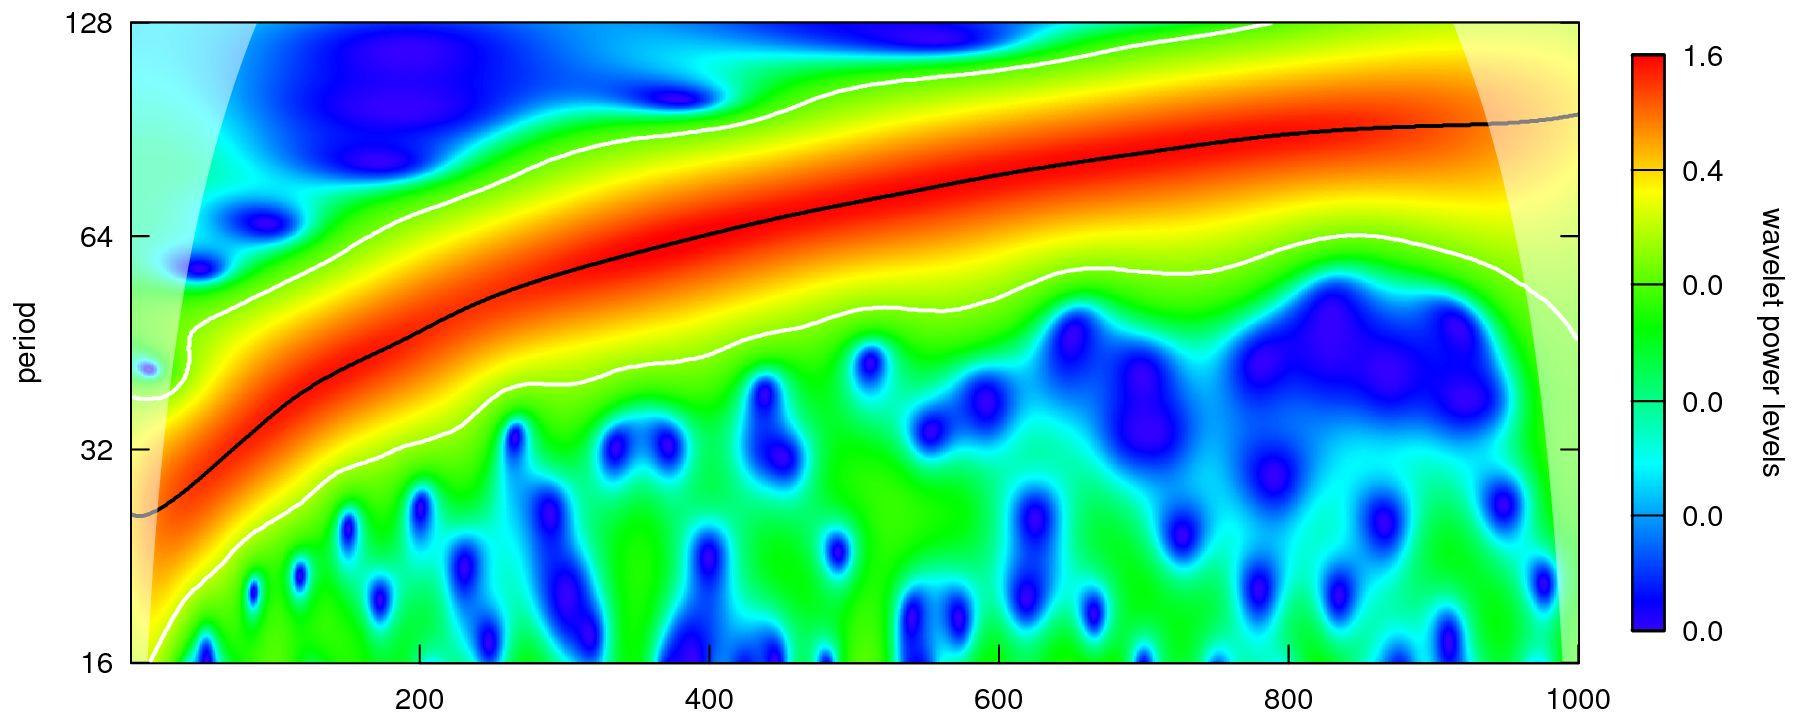 WaveletComp - computational wavelet analysis in R